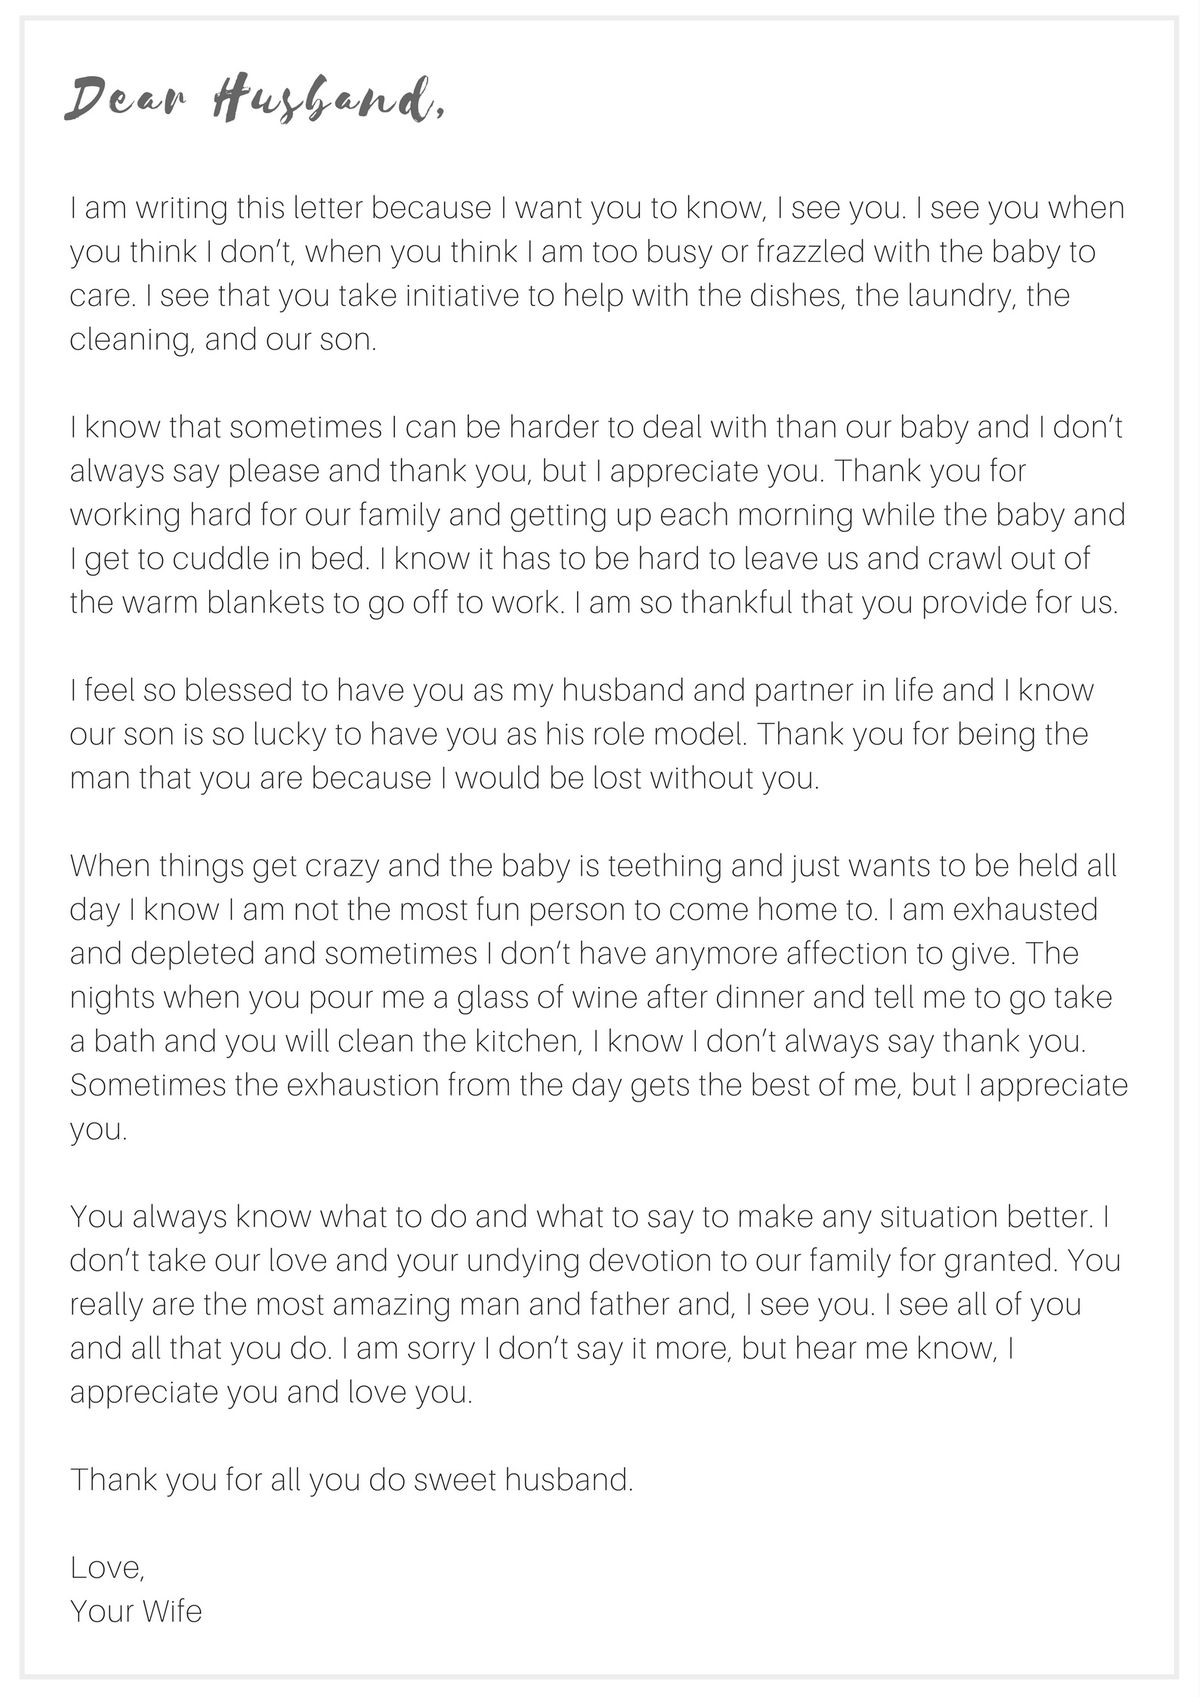 dear-husband-Letter-to-My-Spouse.jpeg